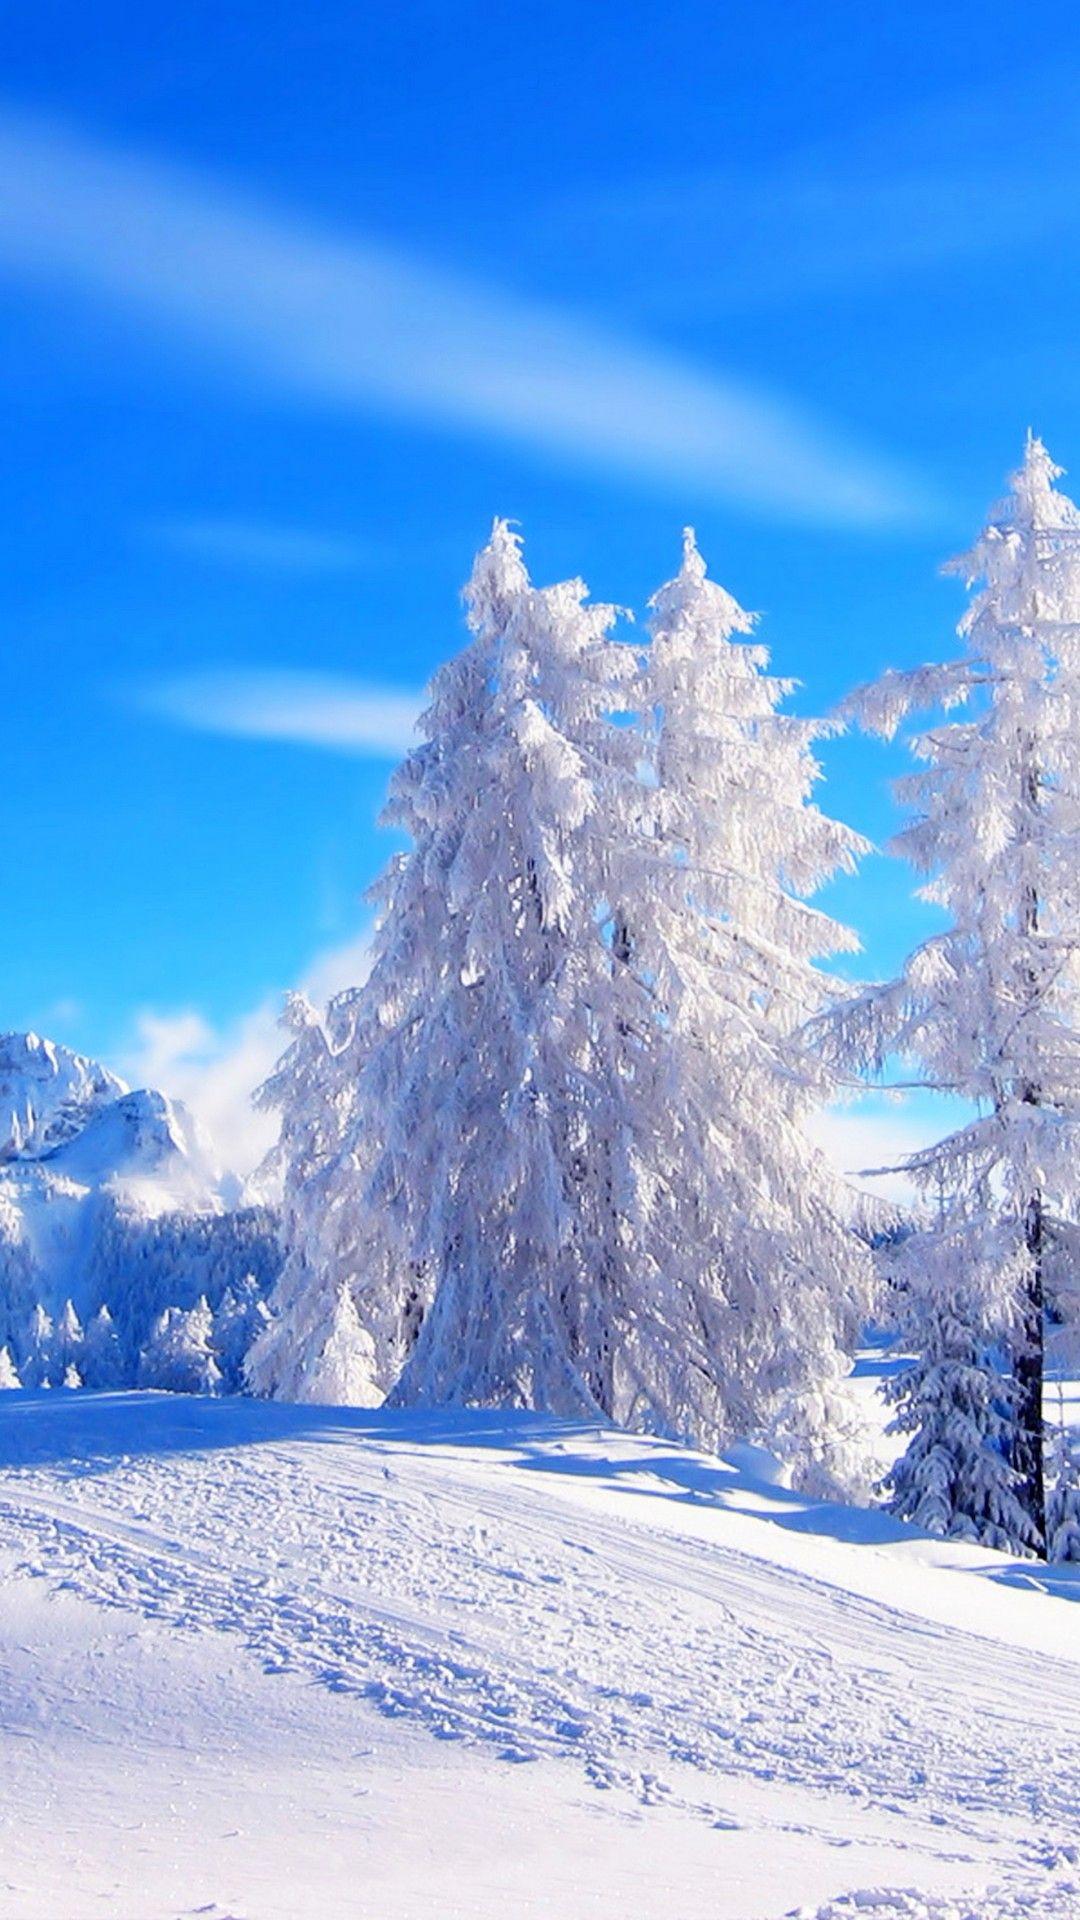 Winter Wonderland Iphone Wallpaper